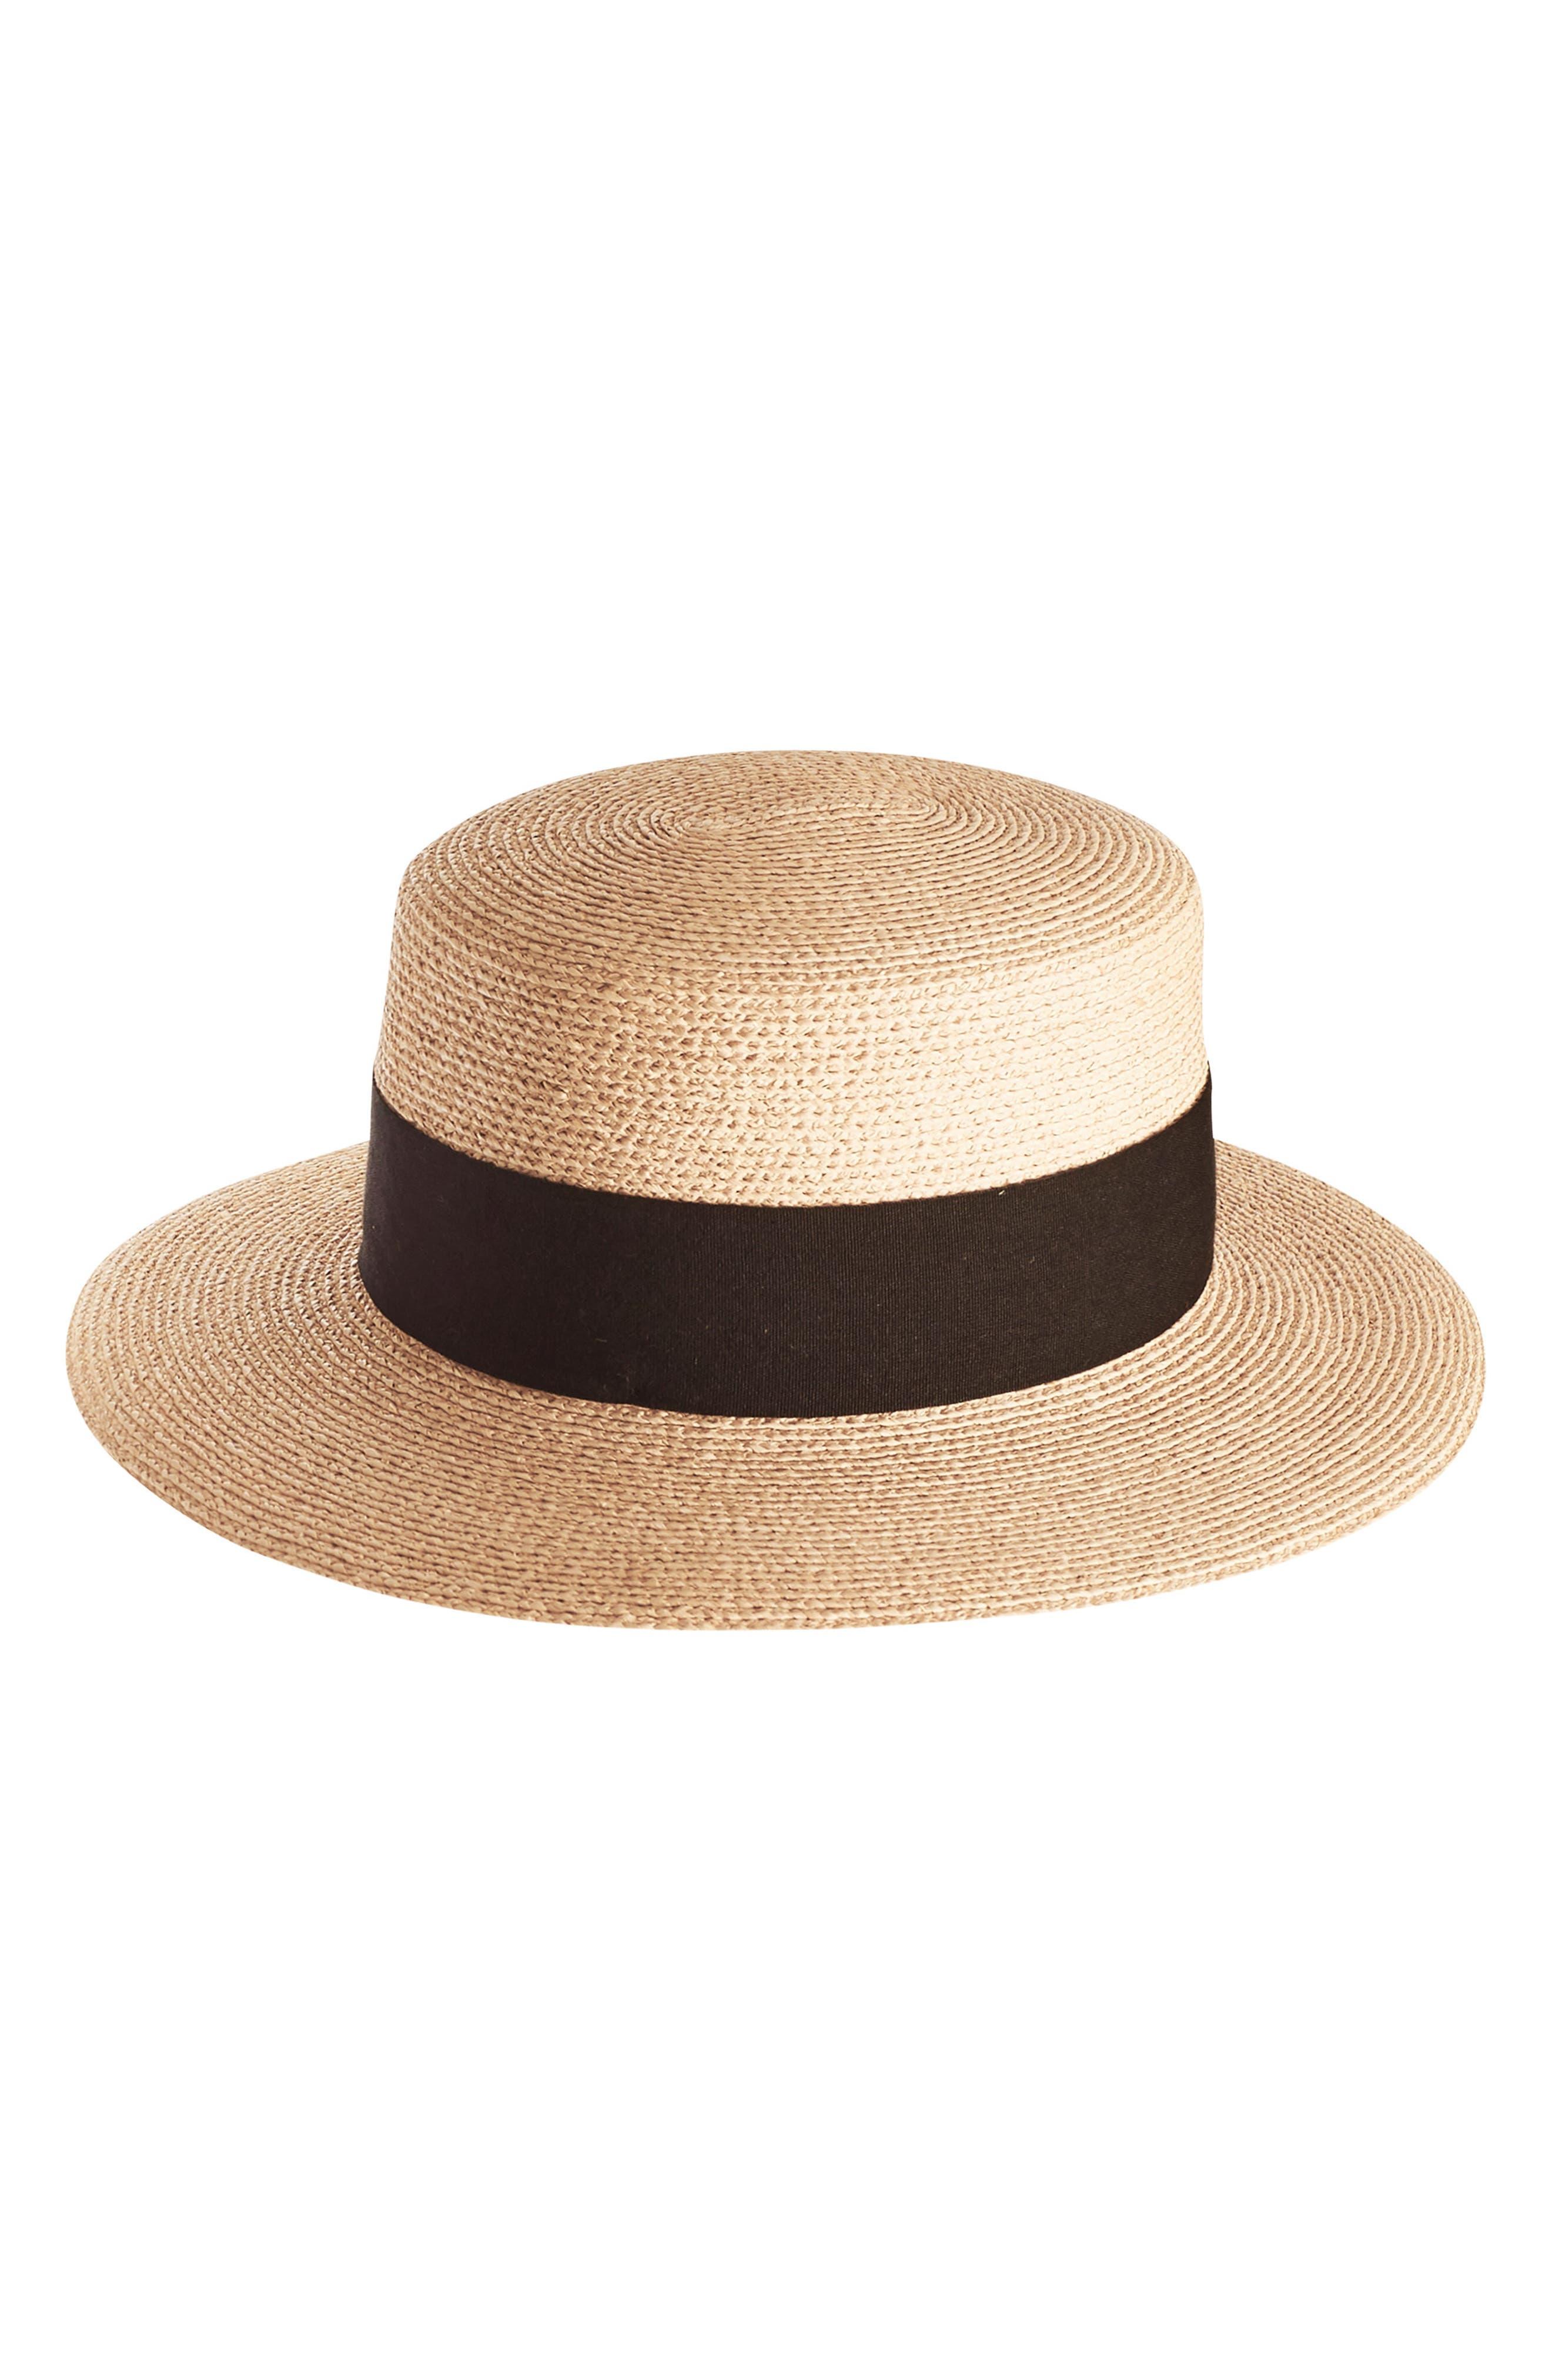 Braided Raffia Boater Hat,                             Main thumbnail 1, color,                             Natural/ Black